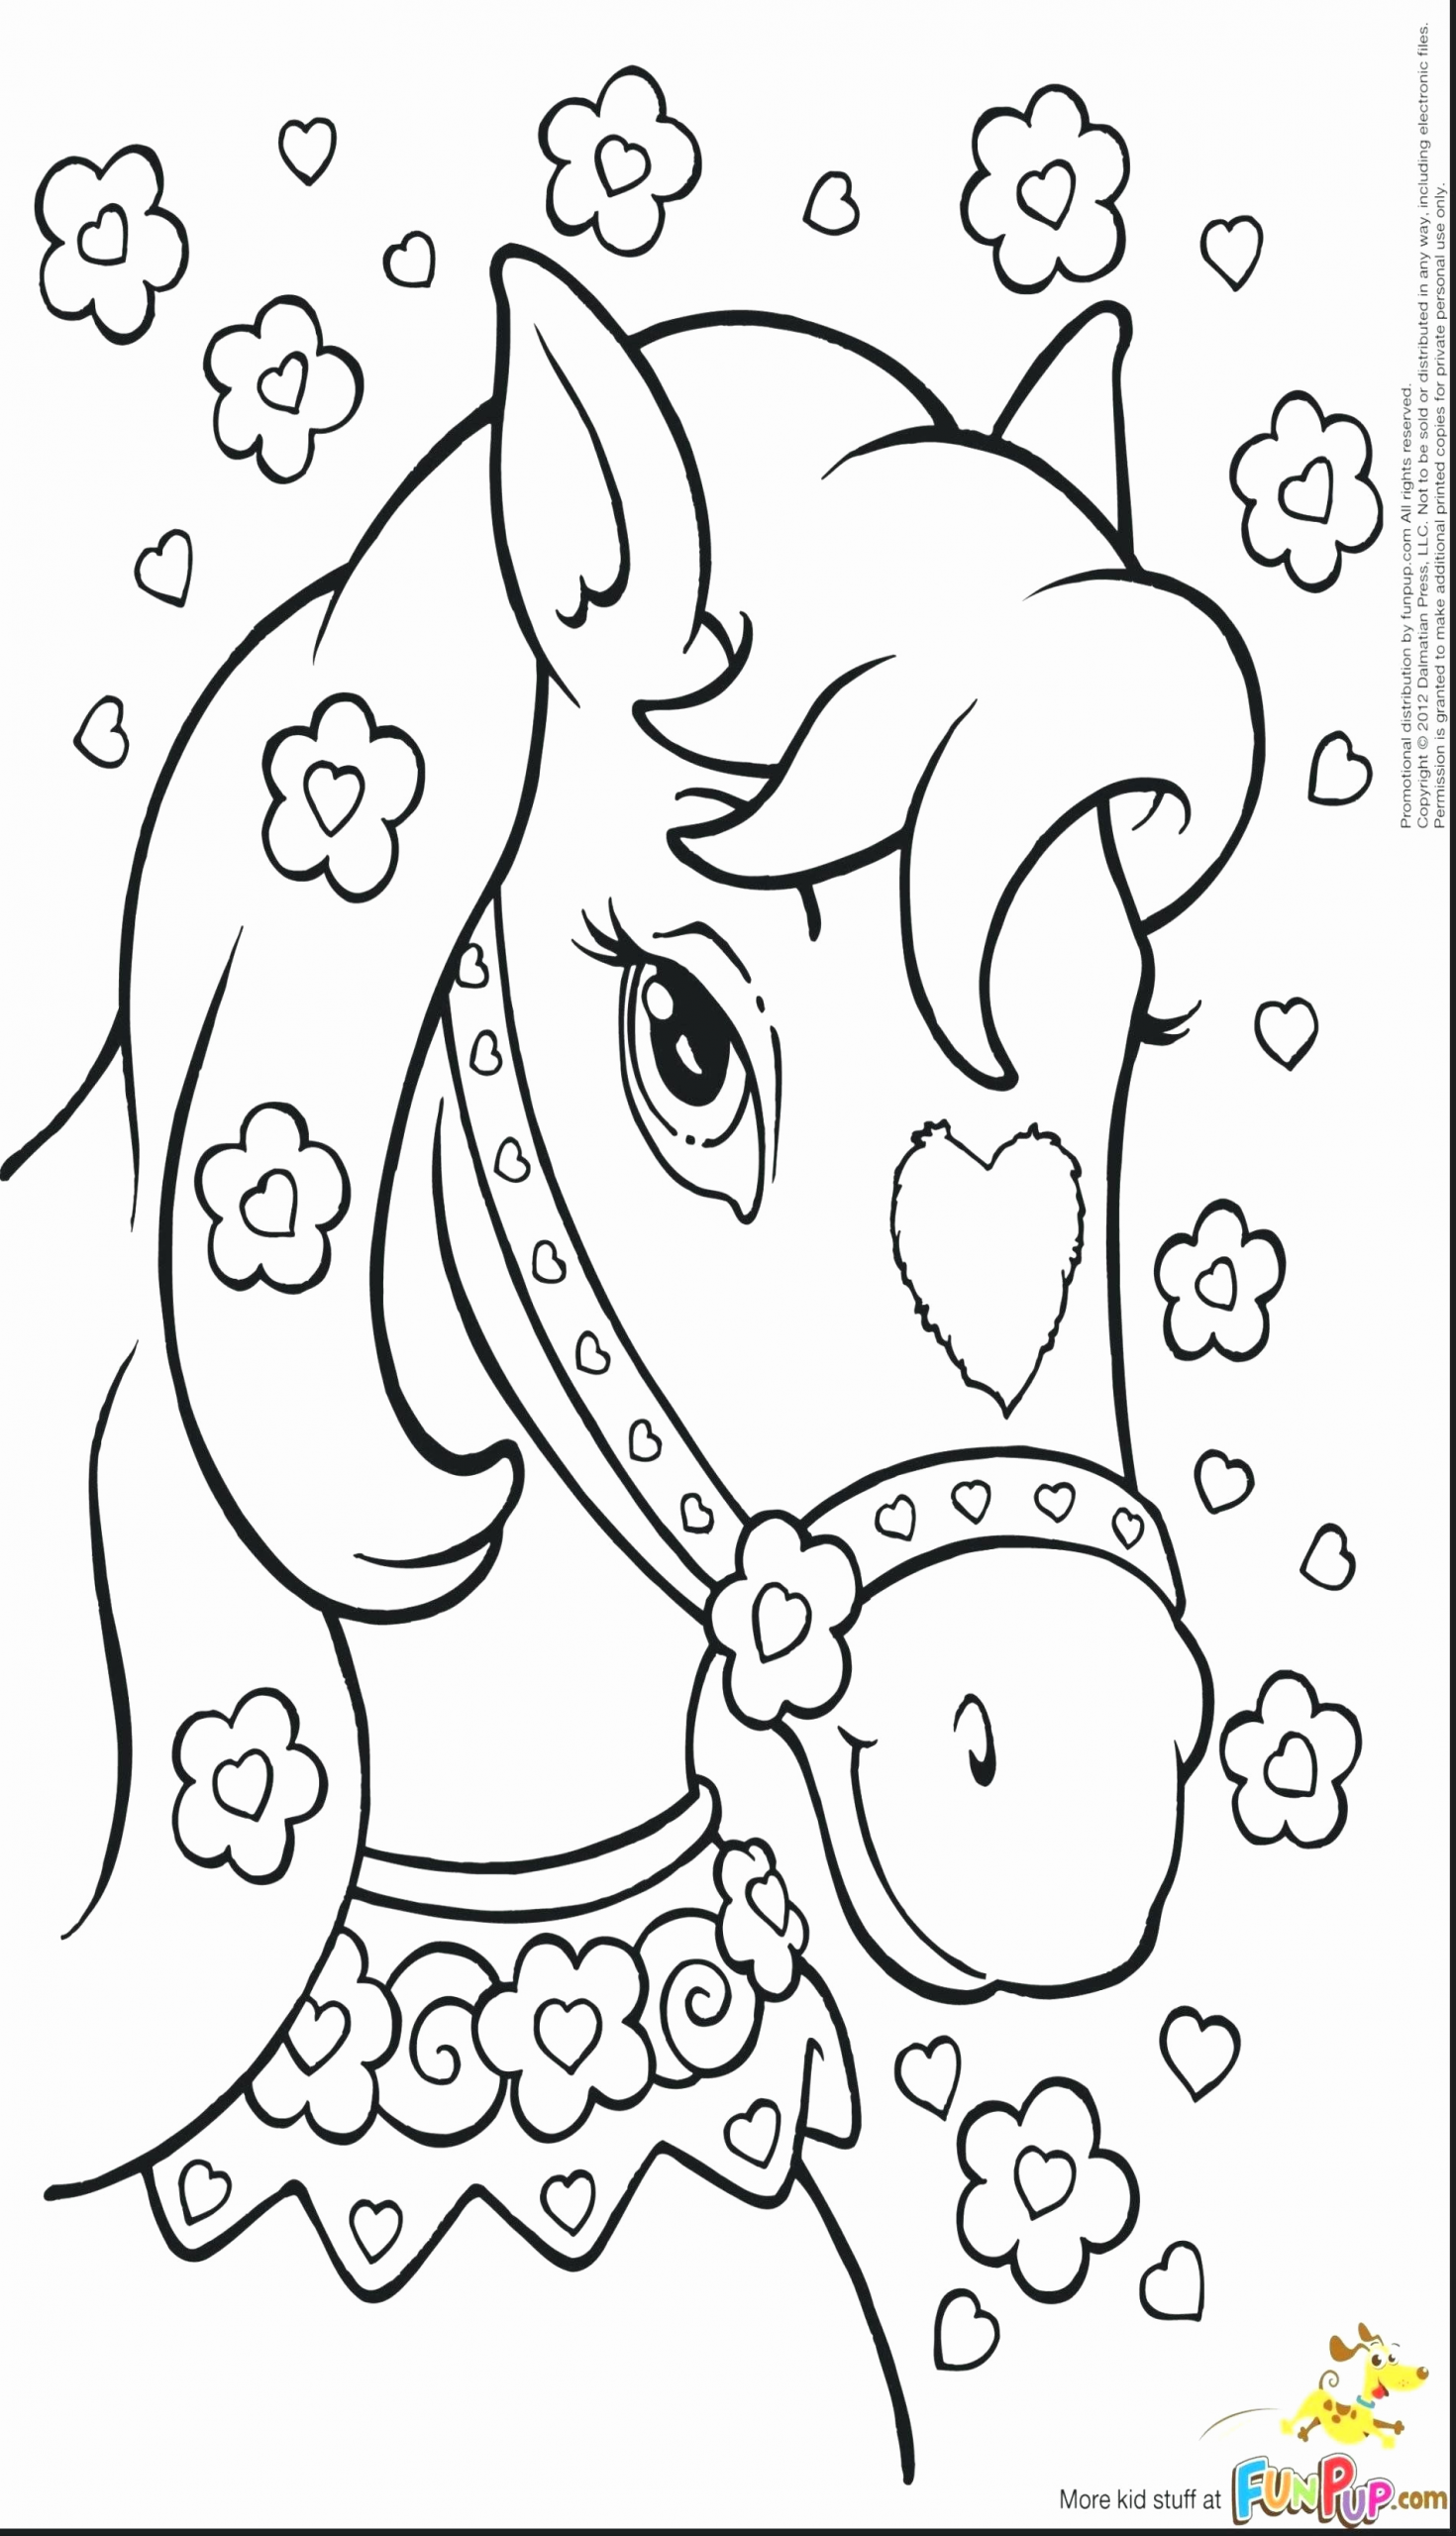 Fun Kids Coloring Pages Disney Horses Unicorn Coloring Pages Horse Coloring Pages Fall Coloring Pages [ 2560 x 1470 Pixel ]